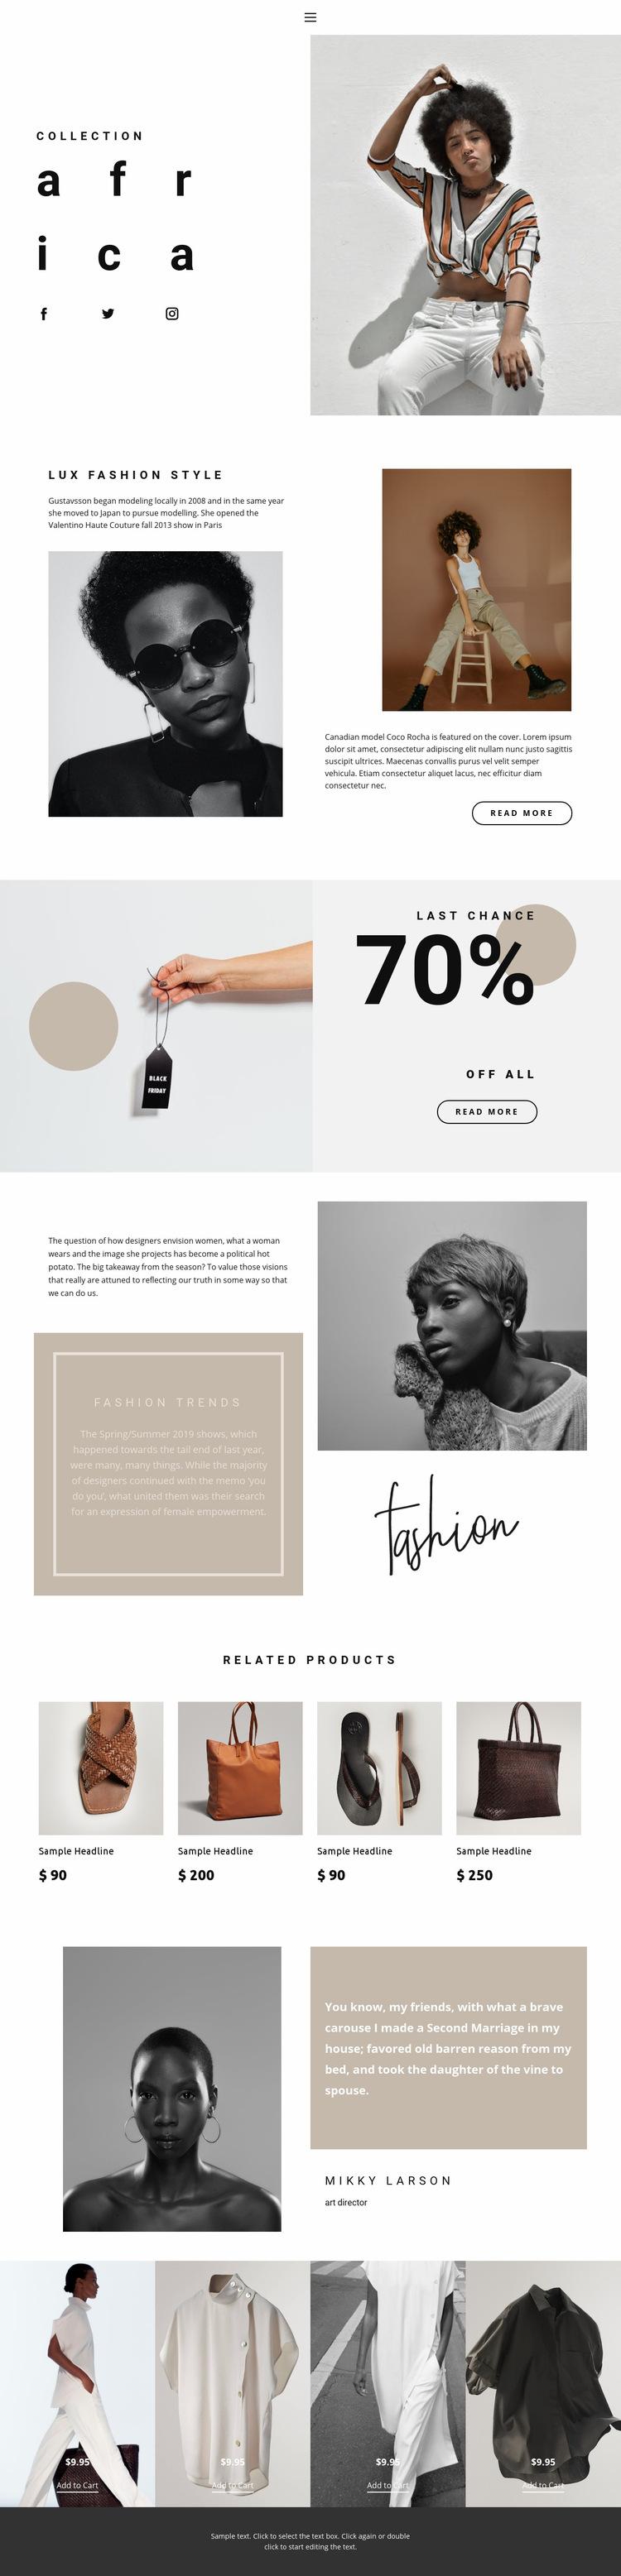 Fashion ideas and advance Web Page Design